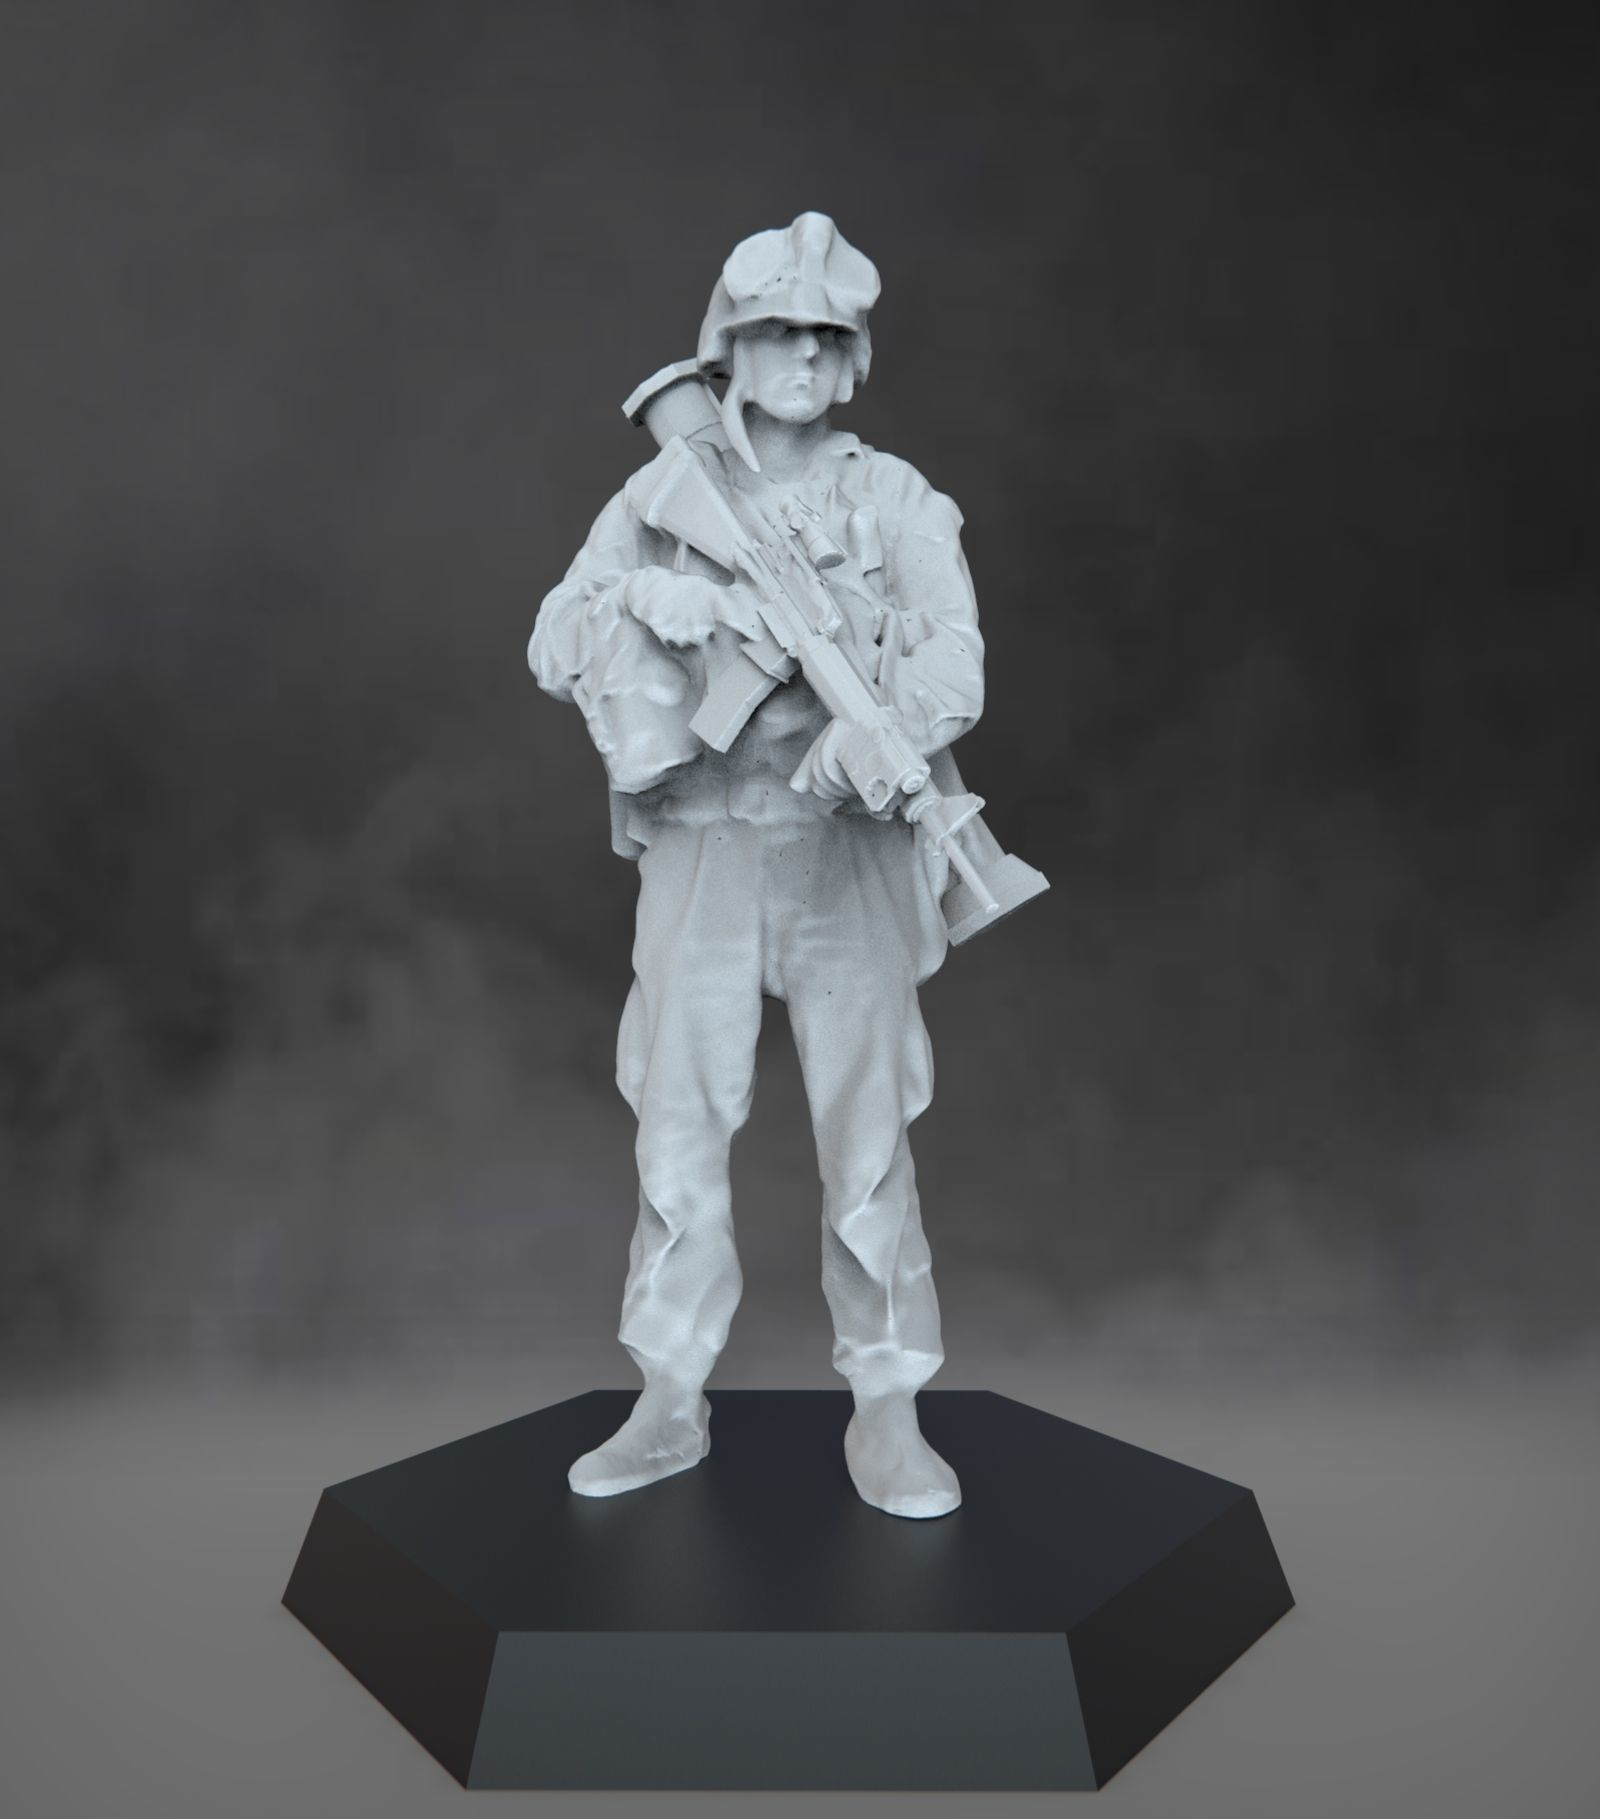 US Marine with grenade launcher - USMC